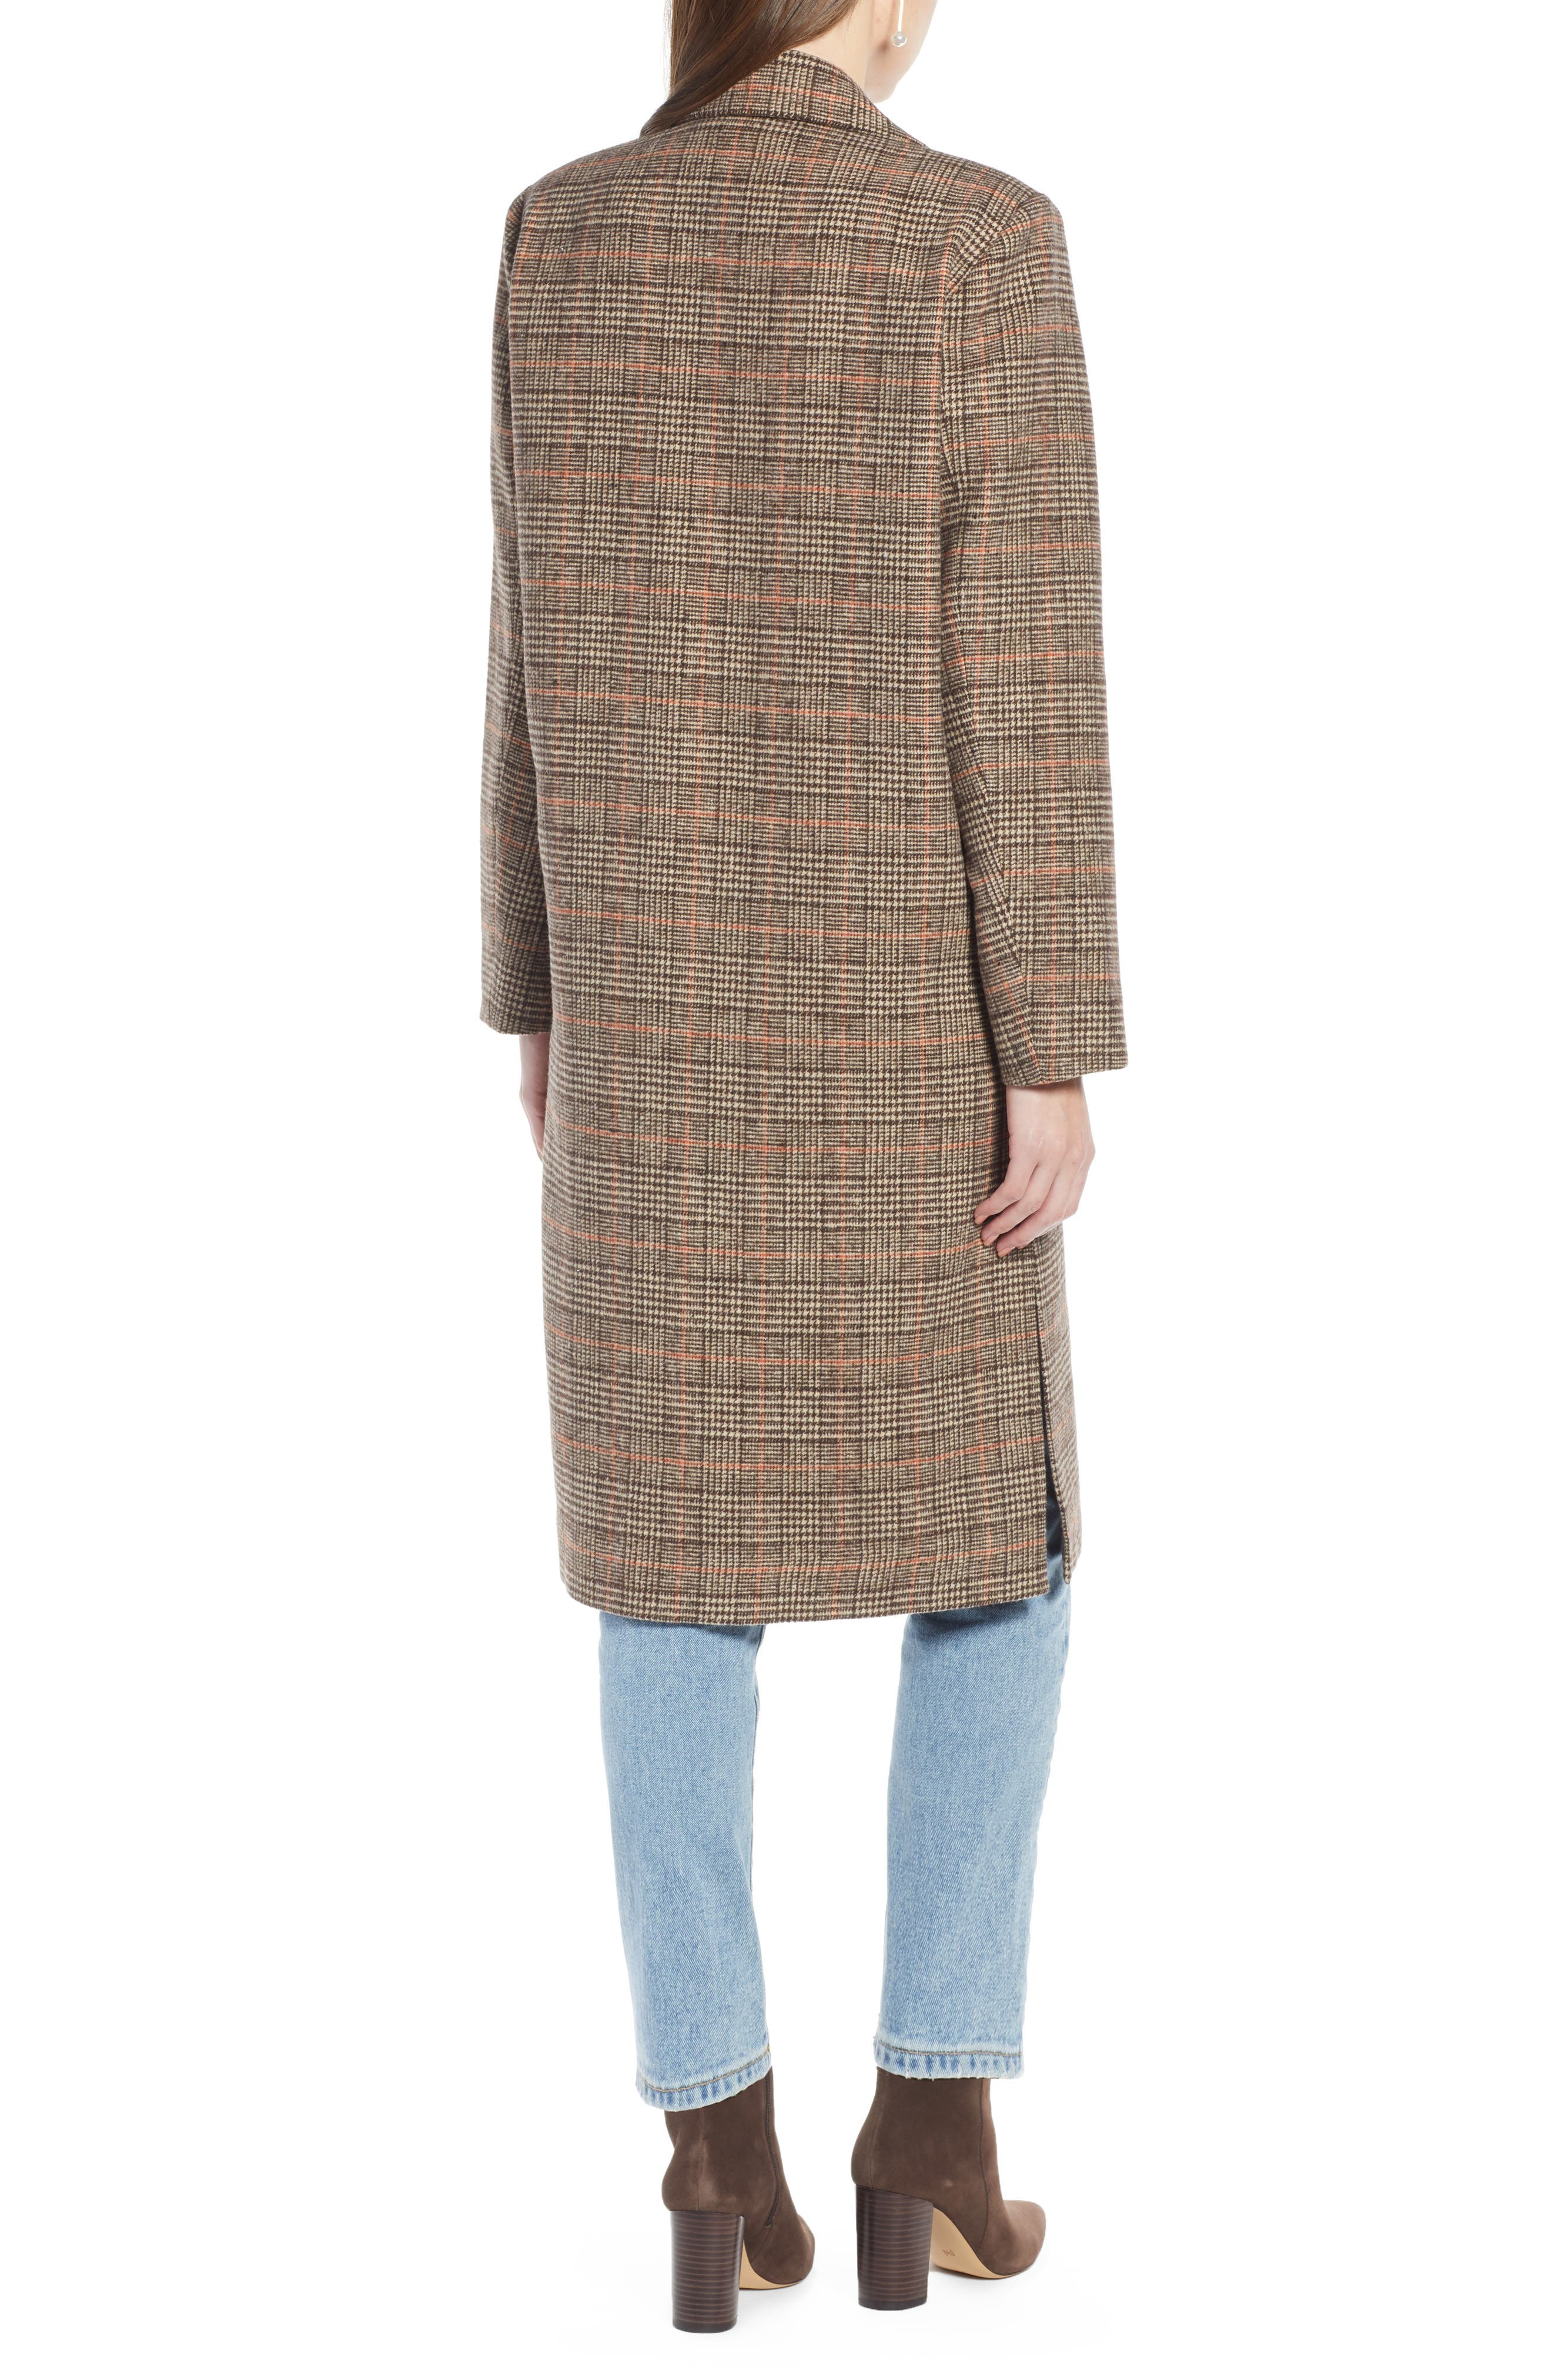 SOMETHING NAVY,                             Patch Pocket Plaid Coat,                             Alternate thumbnail 2, color,                             210